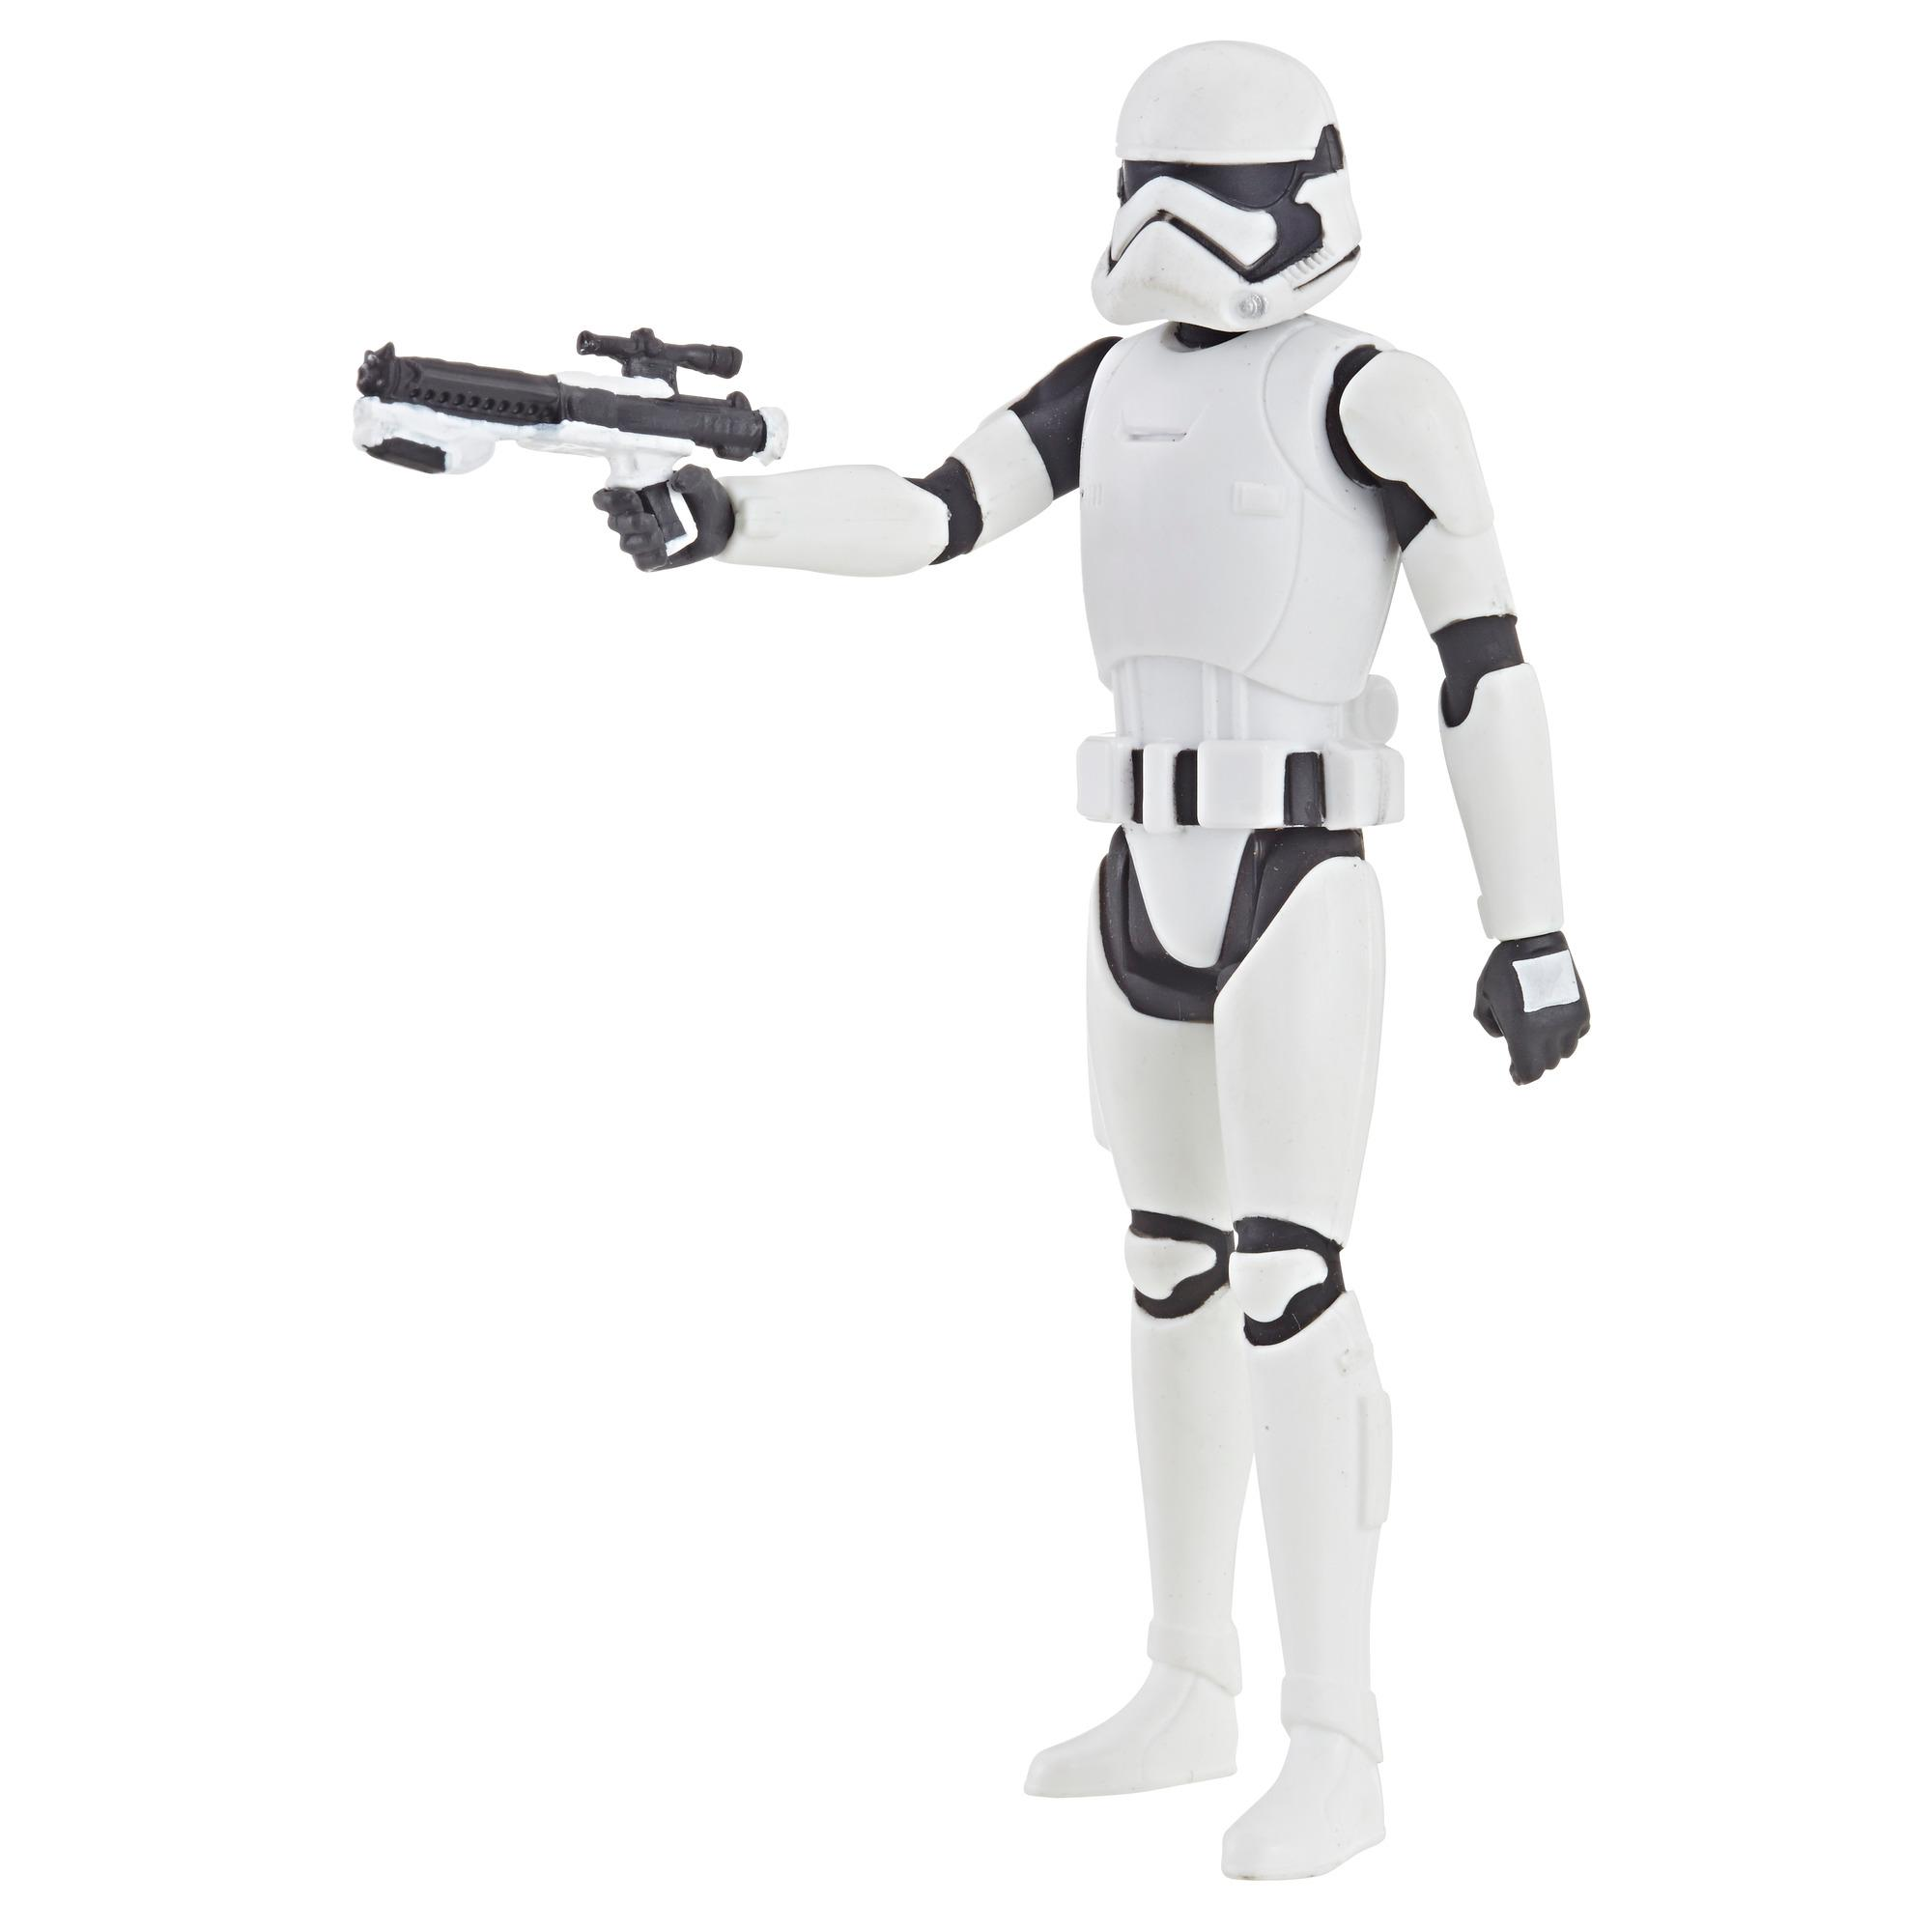 Star Wars Star Wars: Resistance Animated Series 3.75-inch First Order Stormtrooper Figure